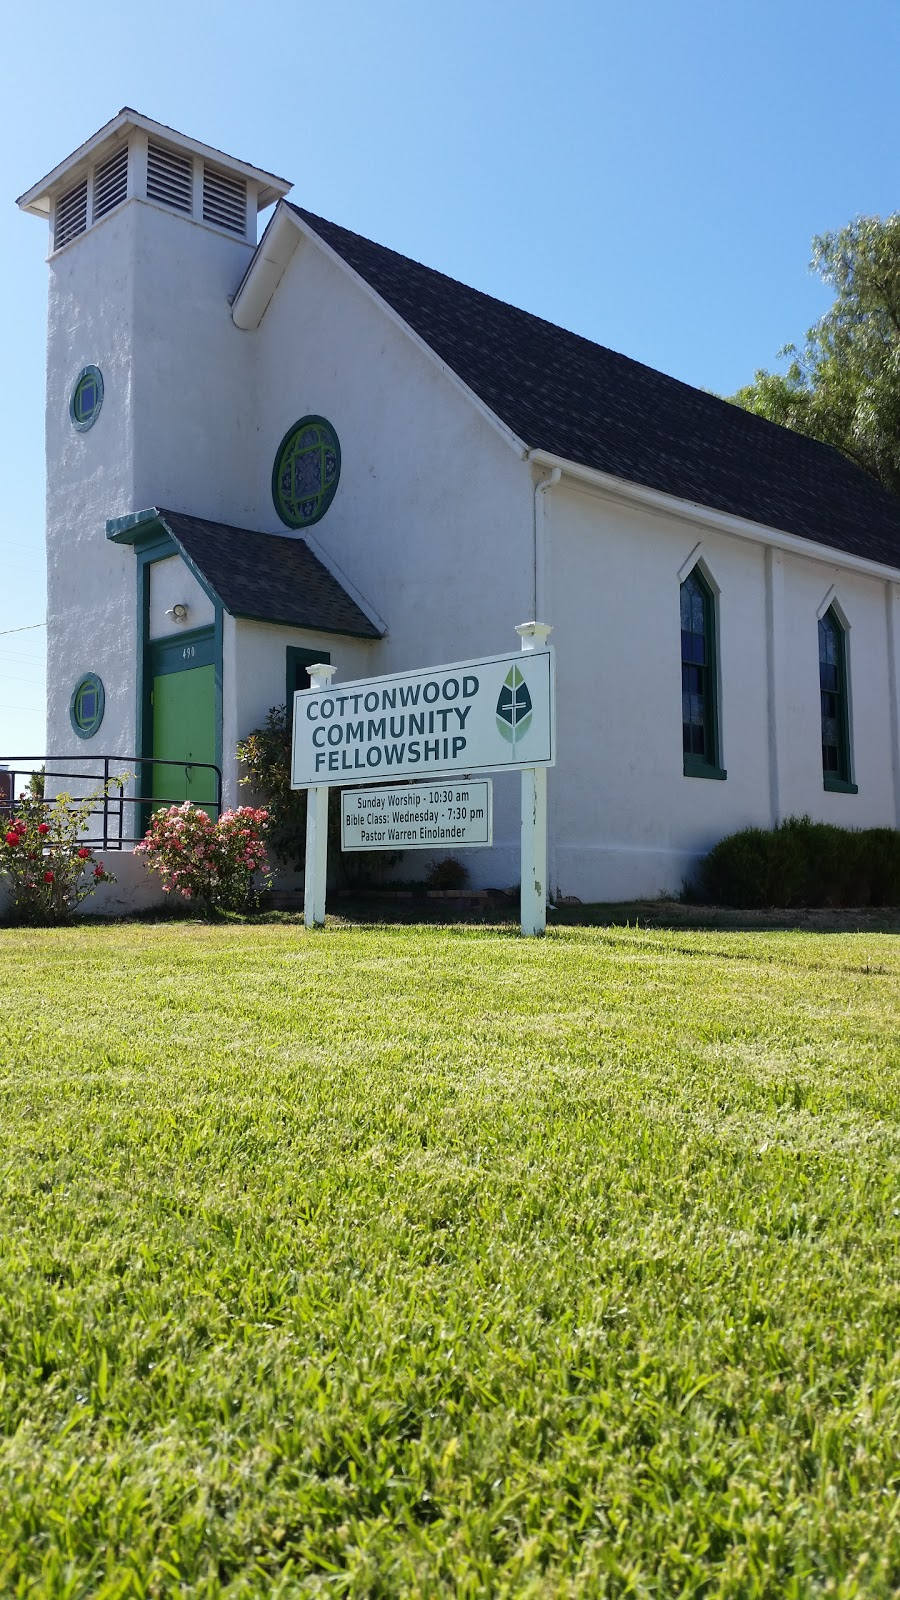 Los Alamos Presbyterian Church - church  | Photo 2 of 4 | Address: 490 Main, Los Alamos, CA 93440, USA | Phone: (805) 344-1686